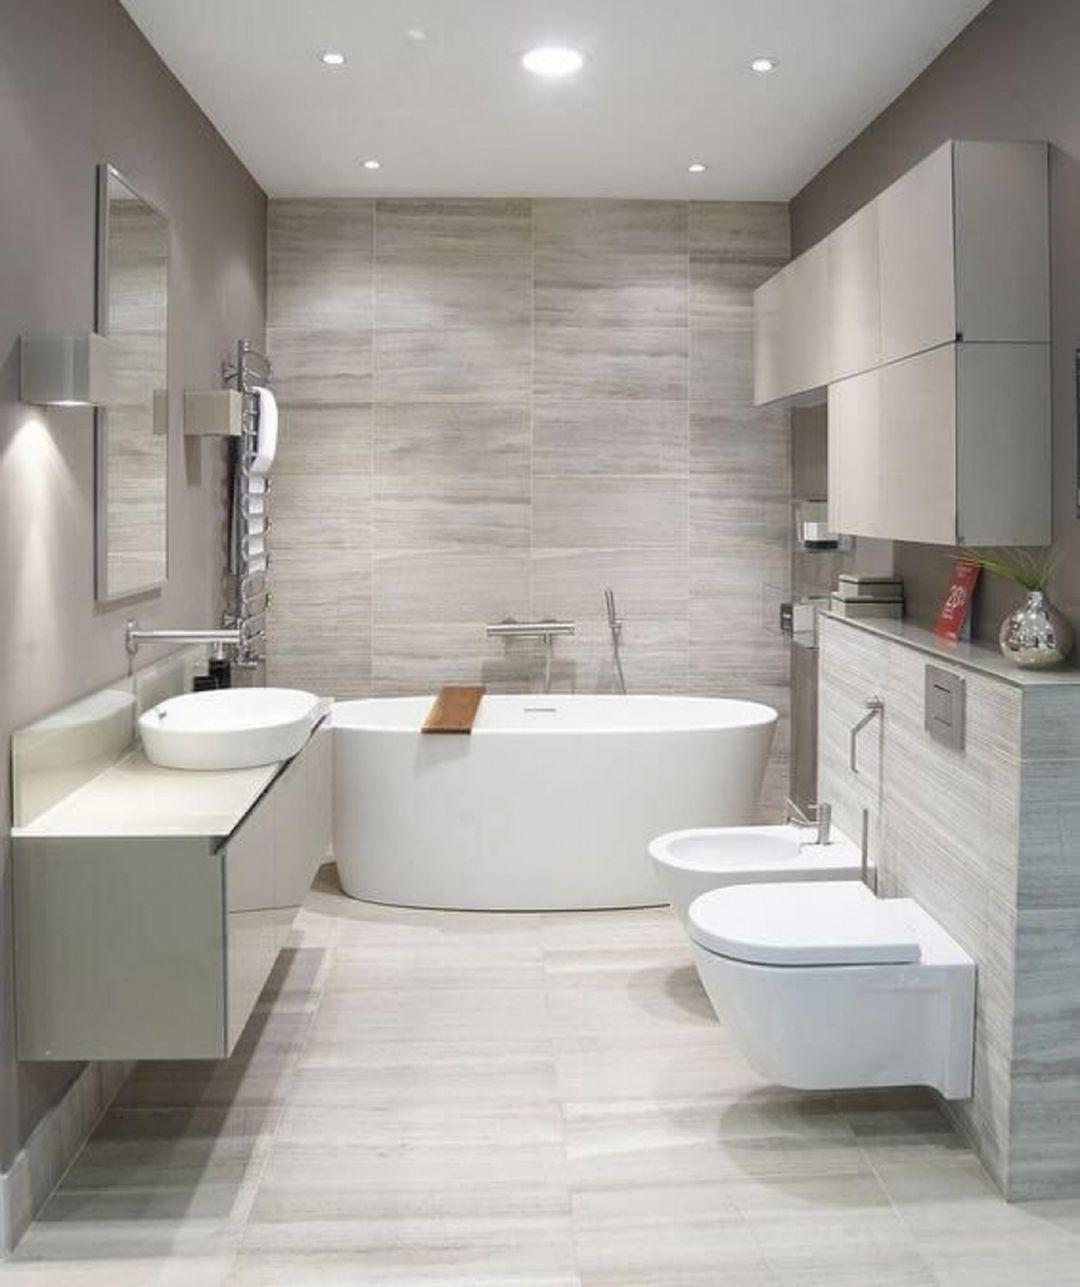 15 Stunning Small Modern Bathroom Design Ideas Most Popular 2019 Modern Bathroom Design Modern Bathroom Contemporary Bathroom Designs